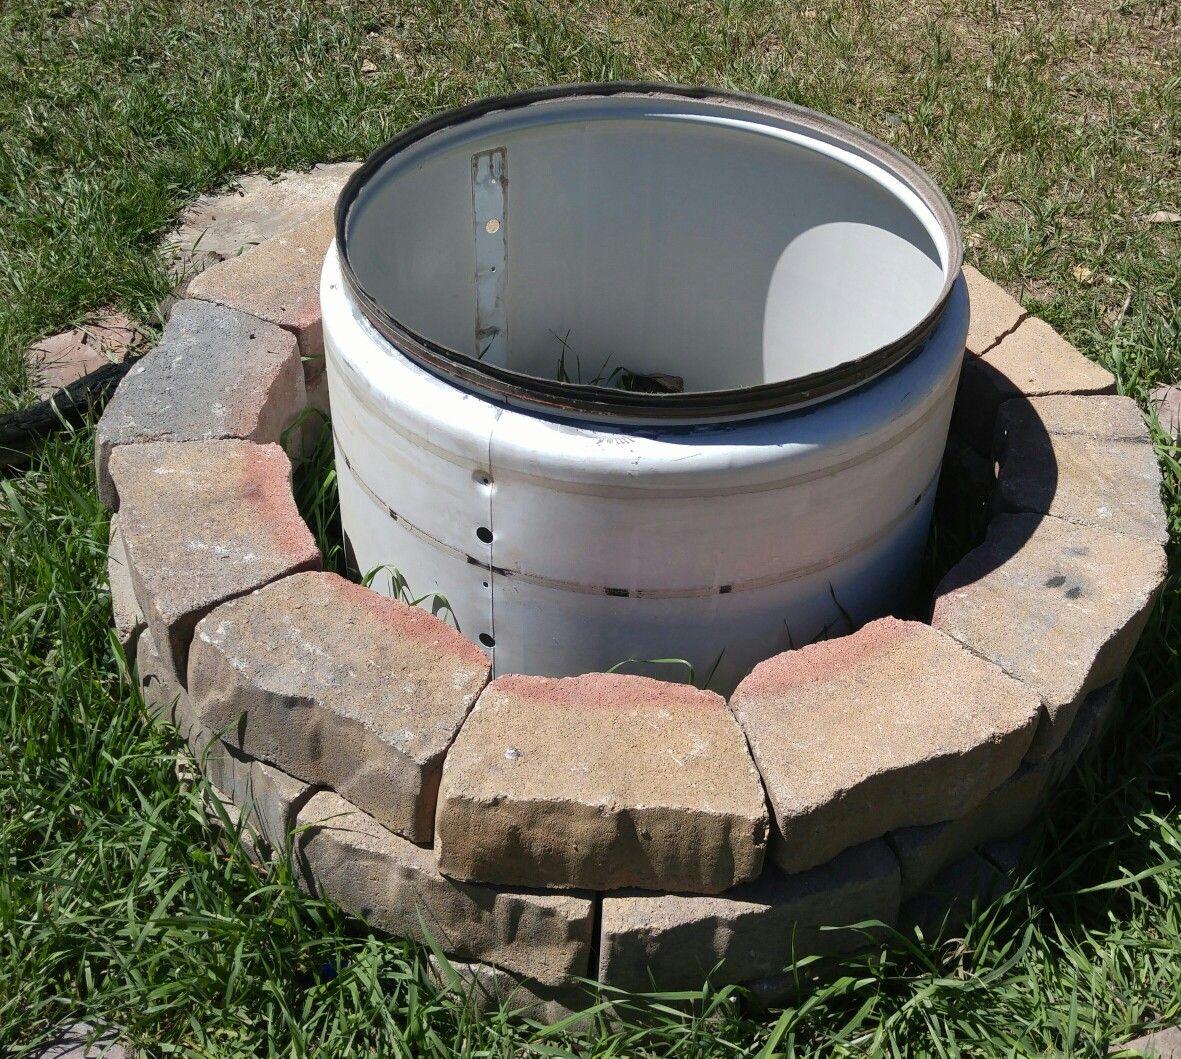 Dryer Drum Fire Pit Outdoor Fire Pit Fire Pit Yard Decor